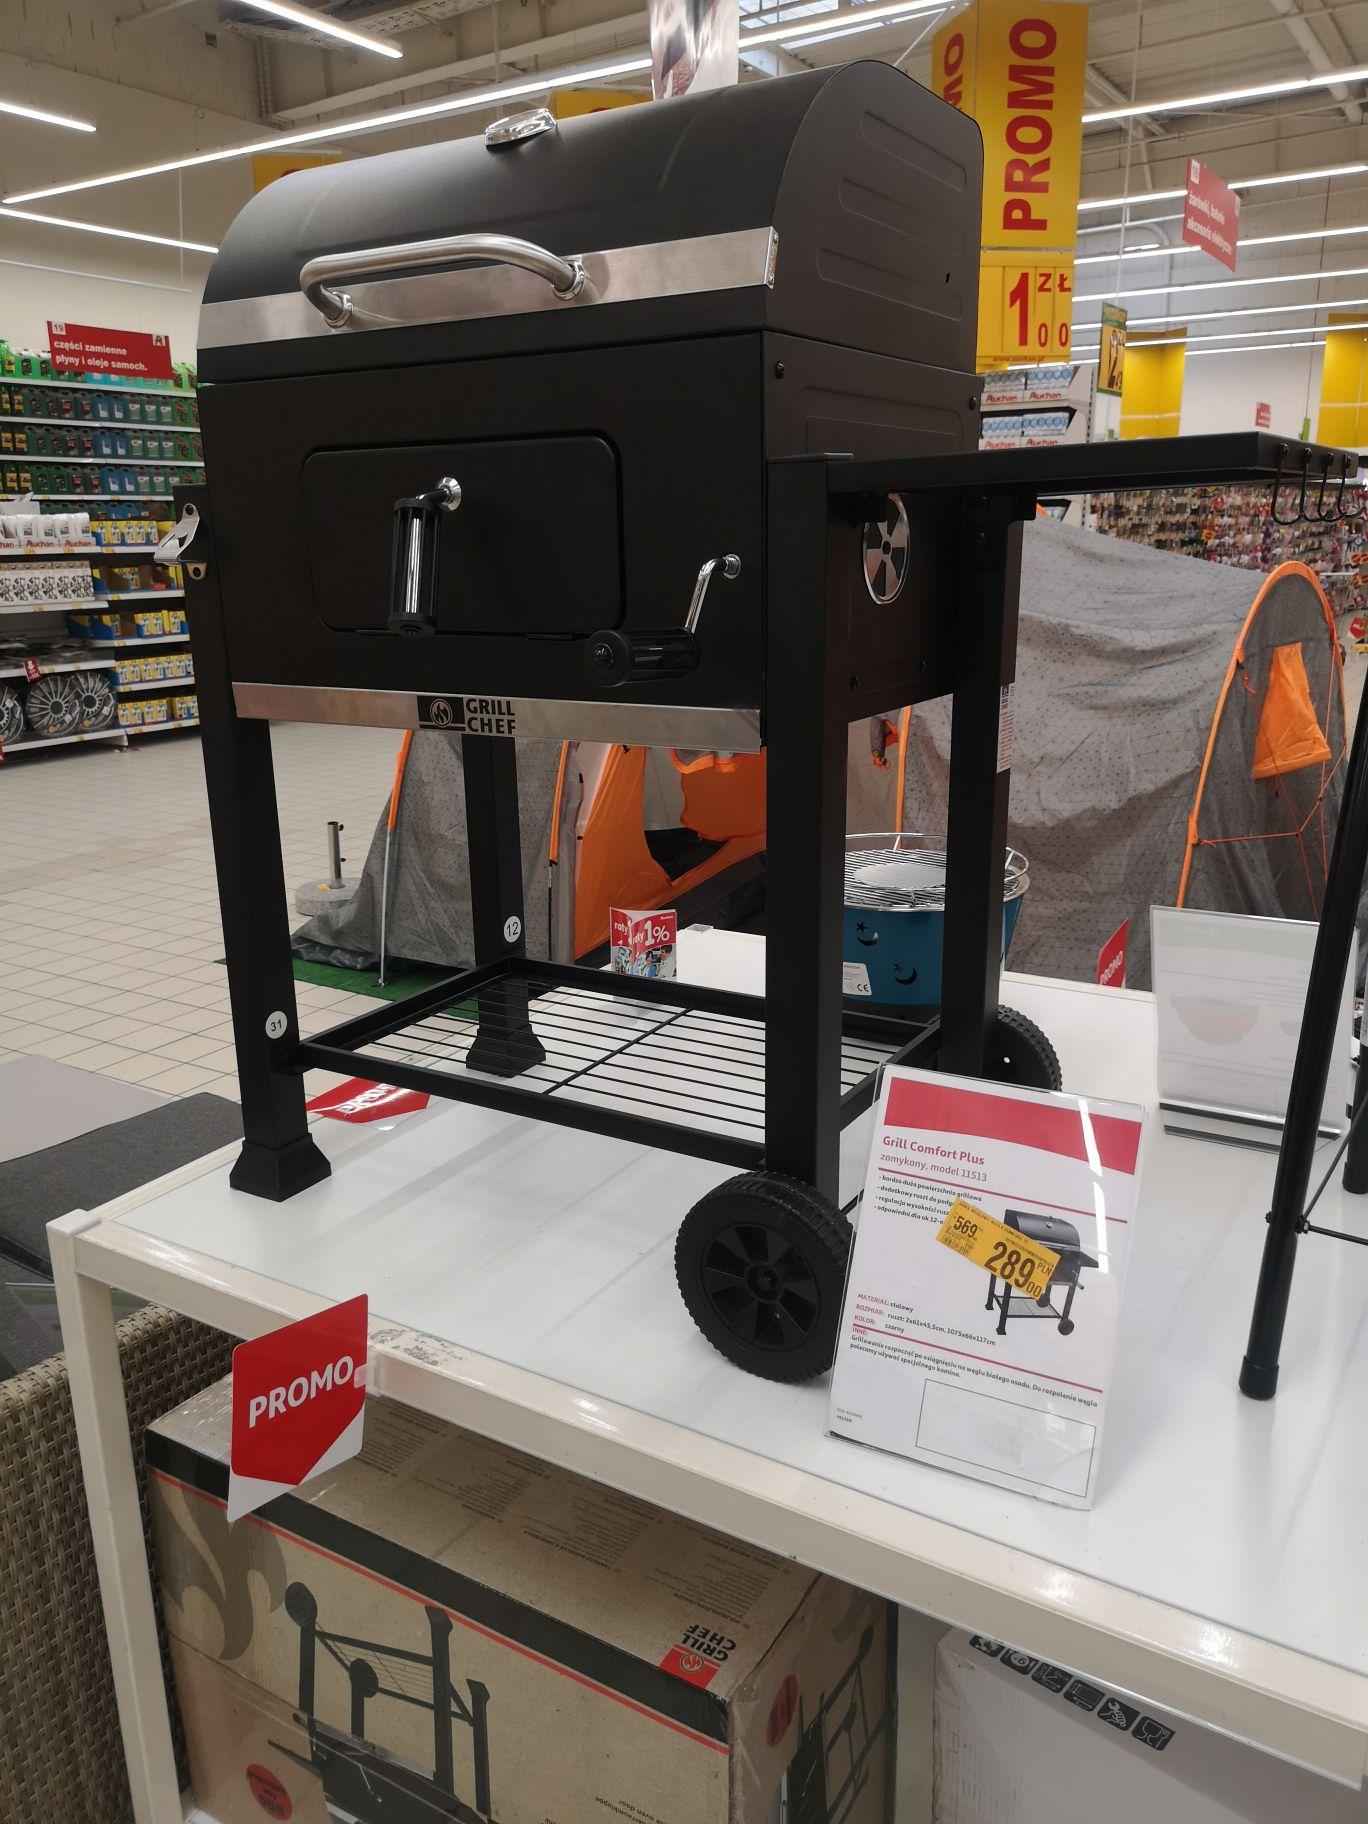 Grill cheff comfort plus 11513 @ Auchan (Kraków)